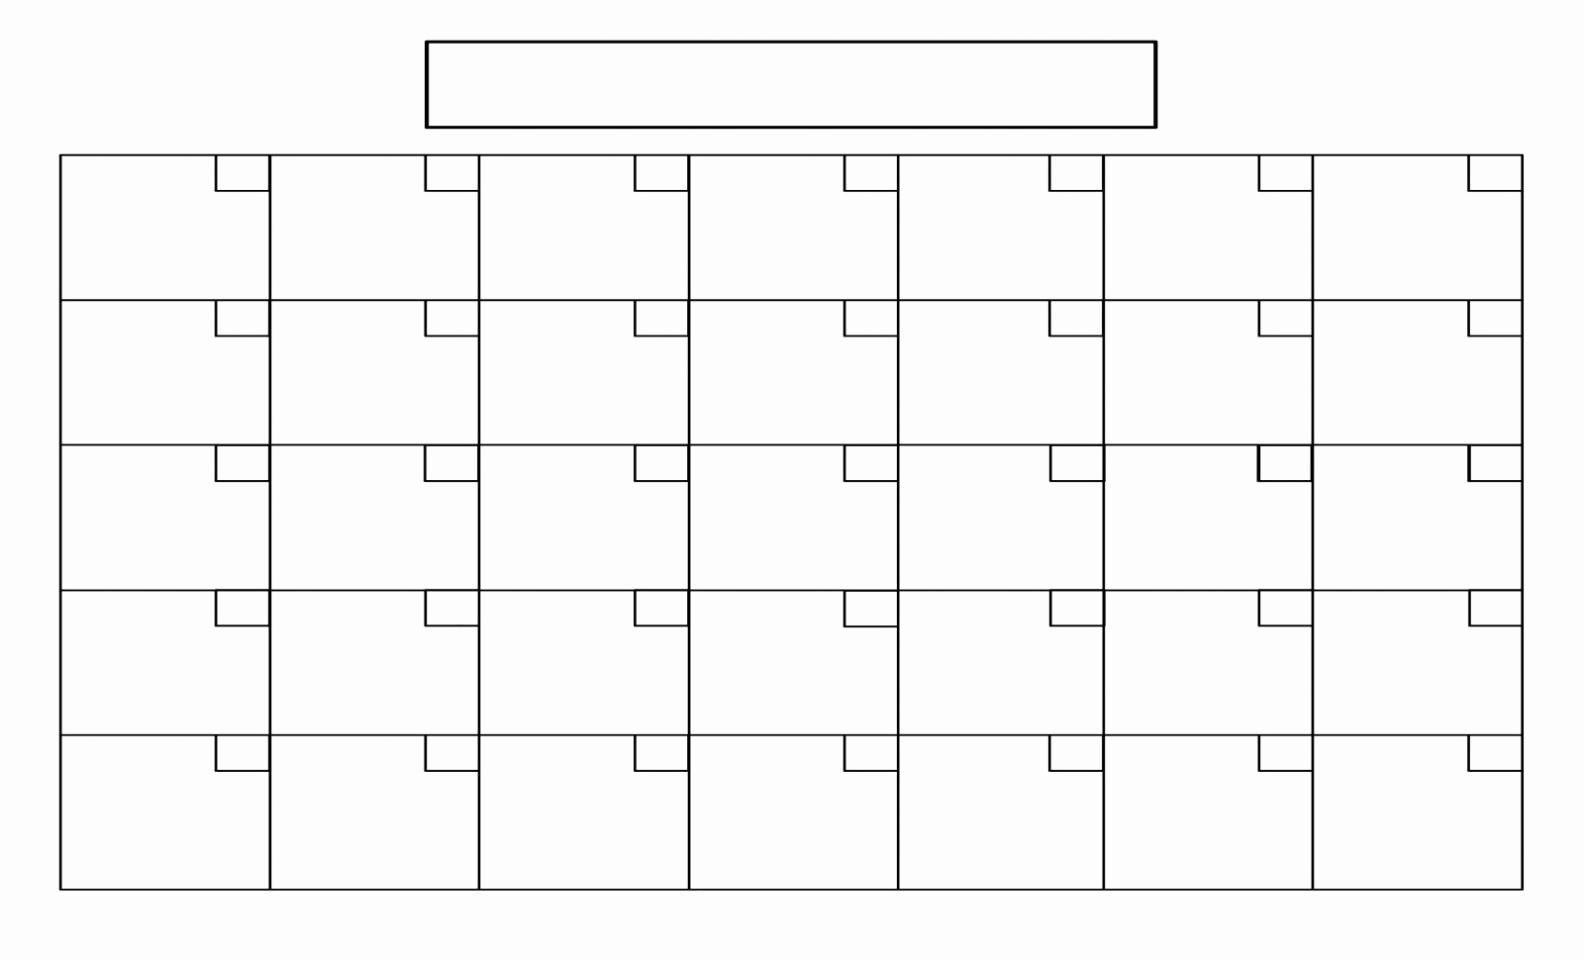 Printable Blank Monthly Calendar Template Unique Blank 12 Month Calendar Template 2017